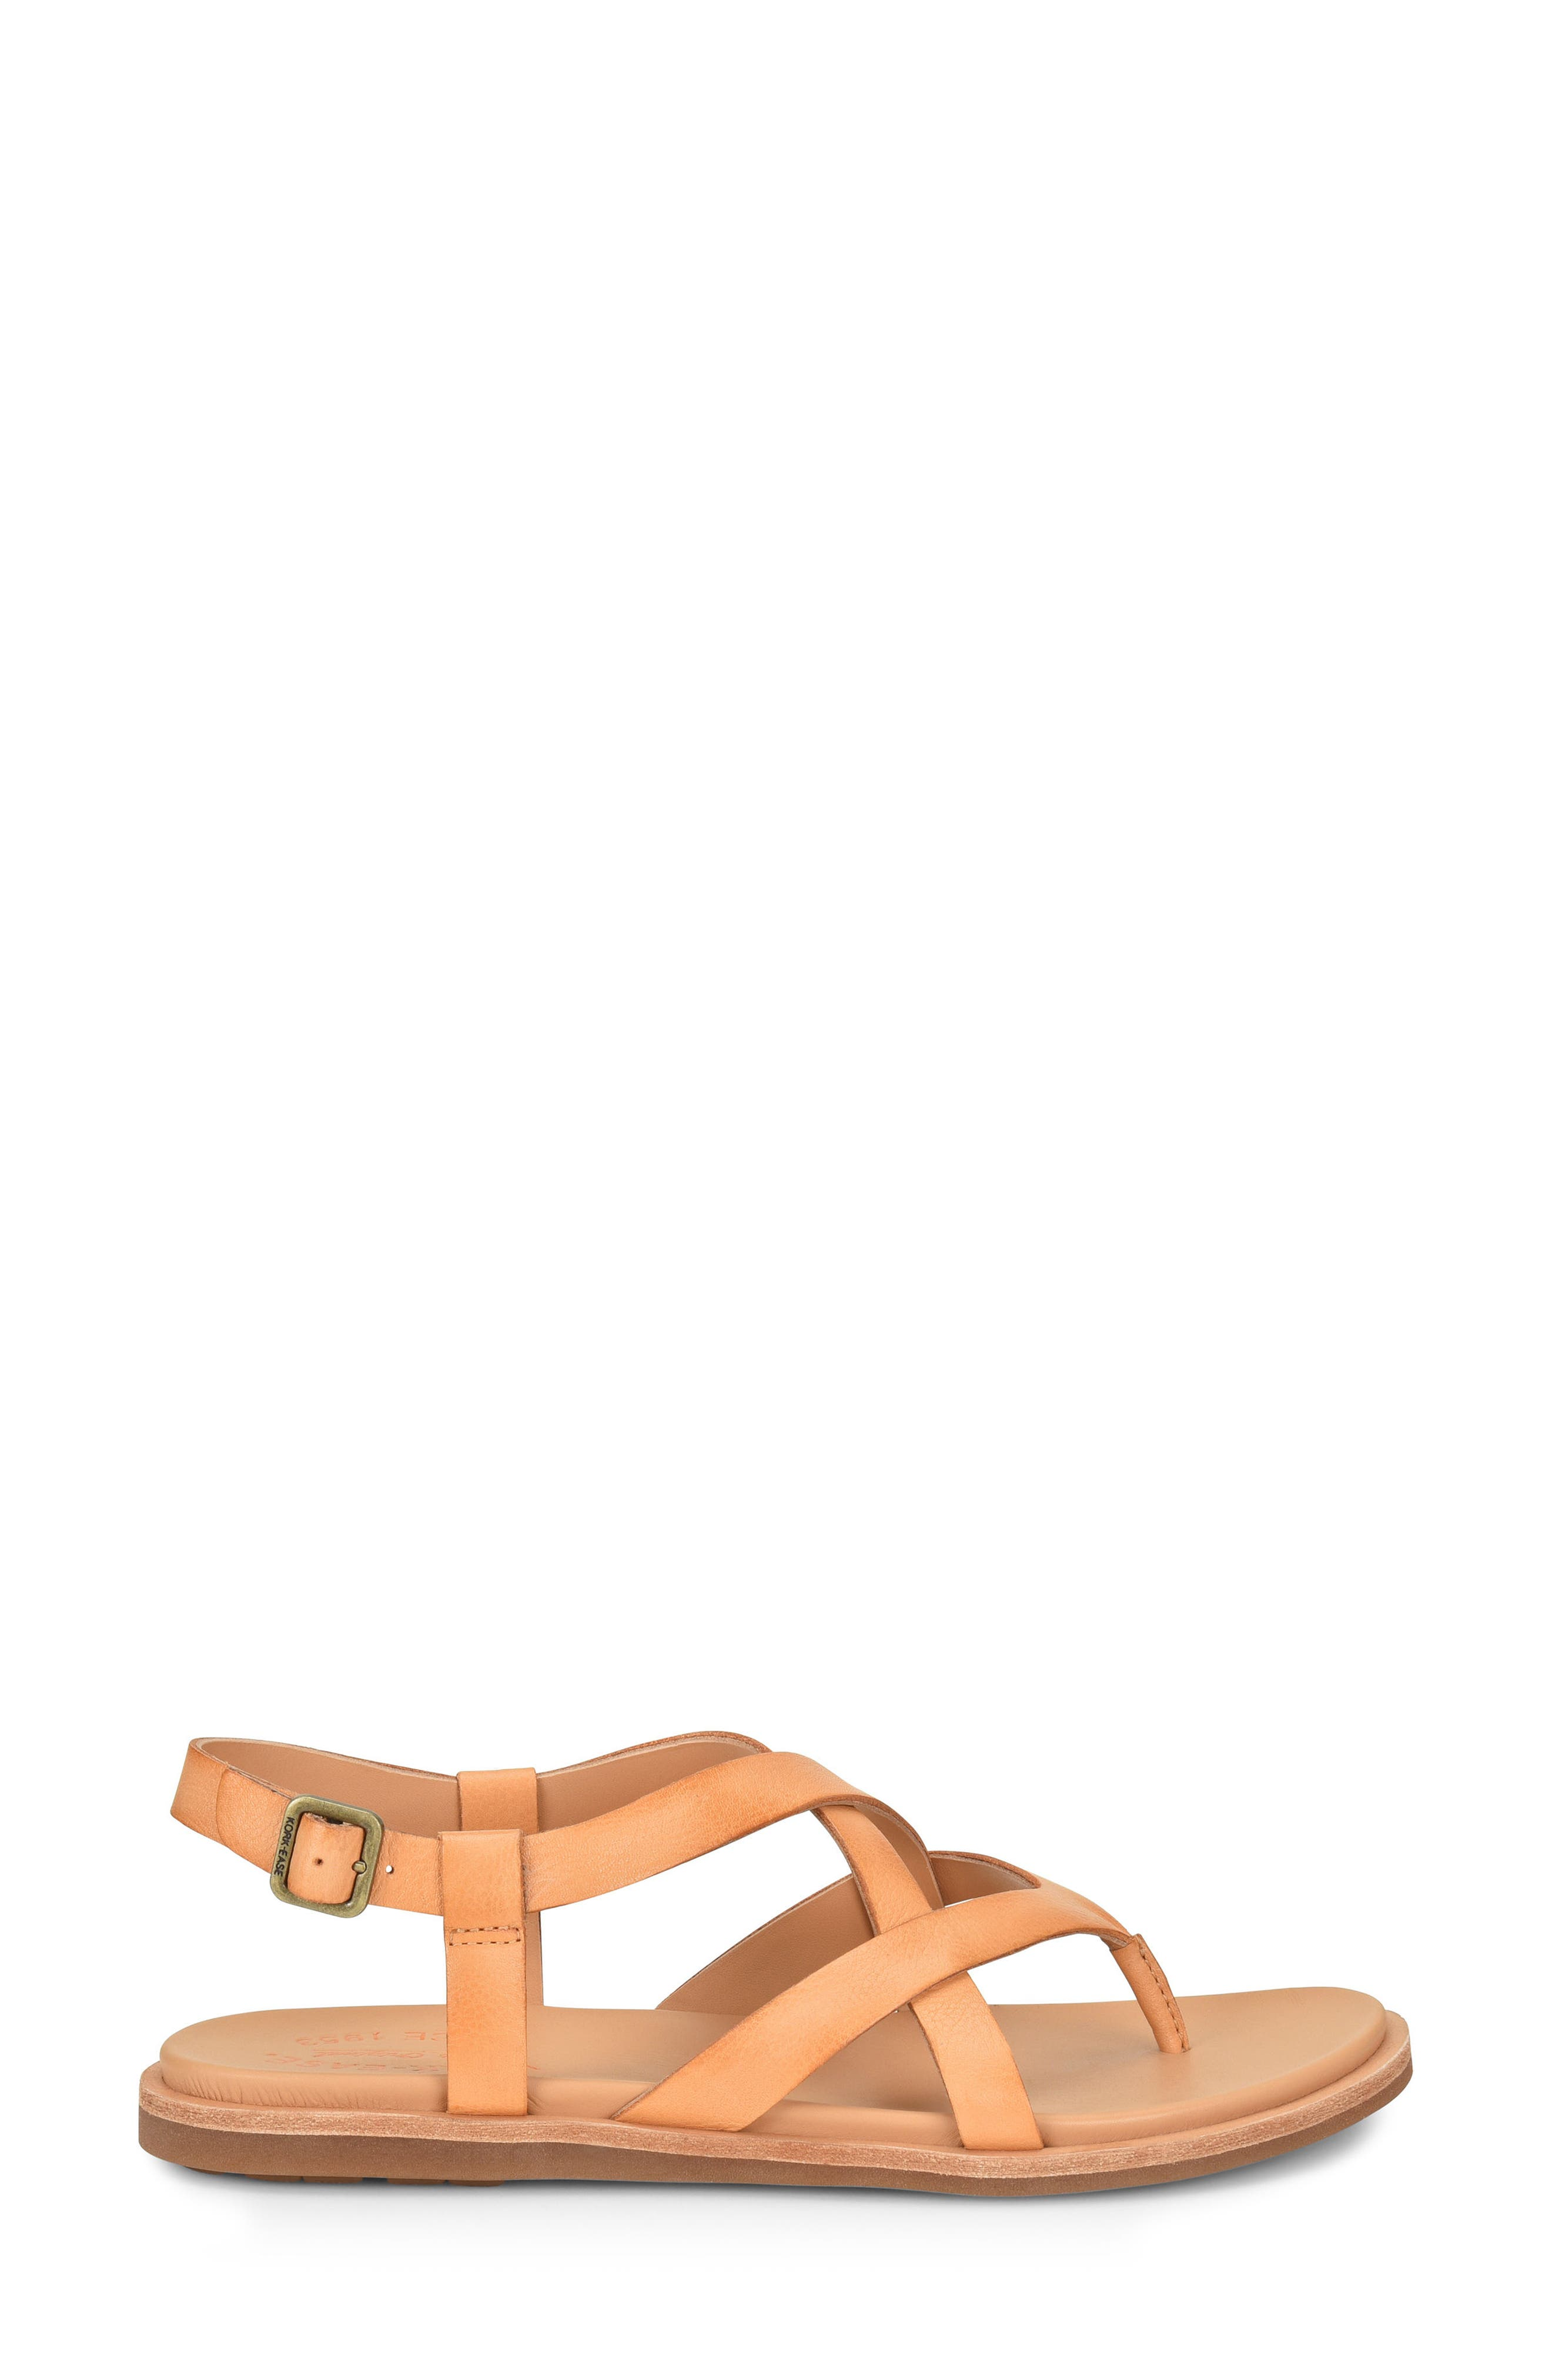 Yarbrough Sandal,                             Alternate thumbnail 3, color,                             ORANGE LEATHER